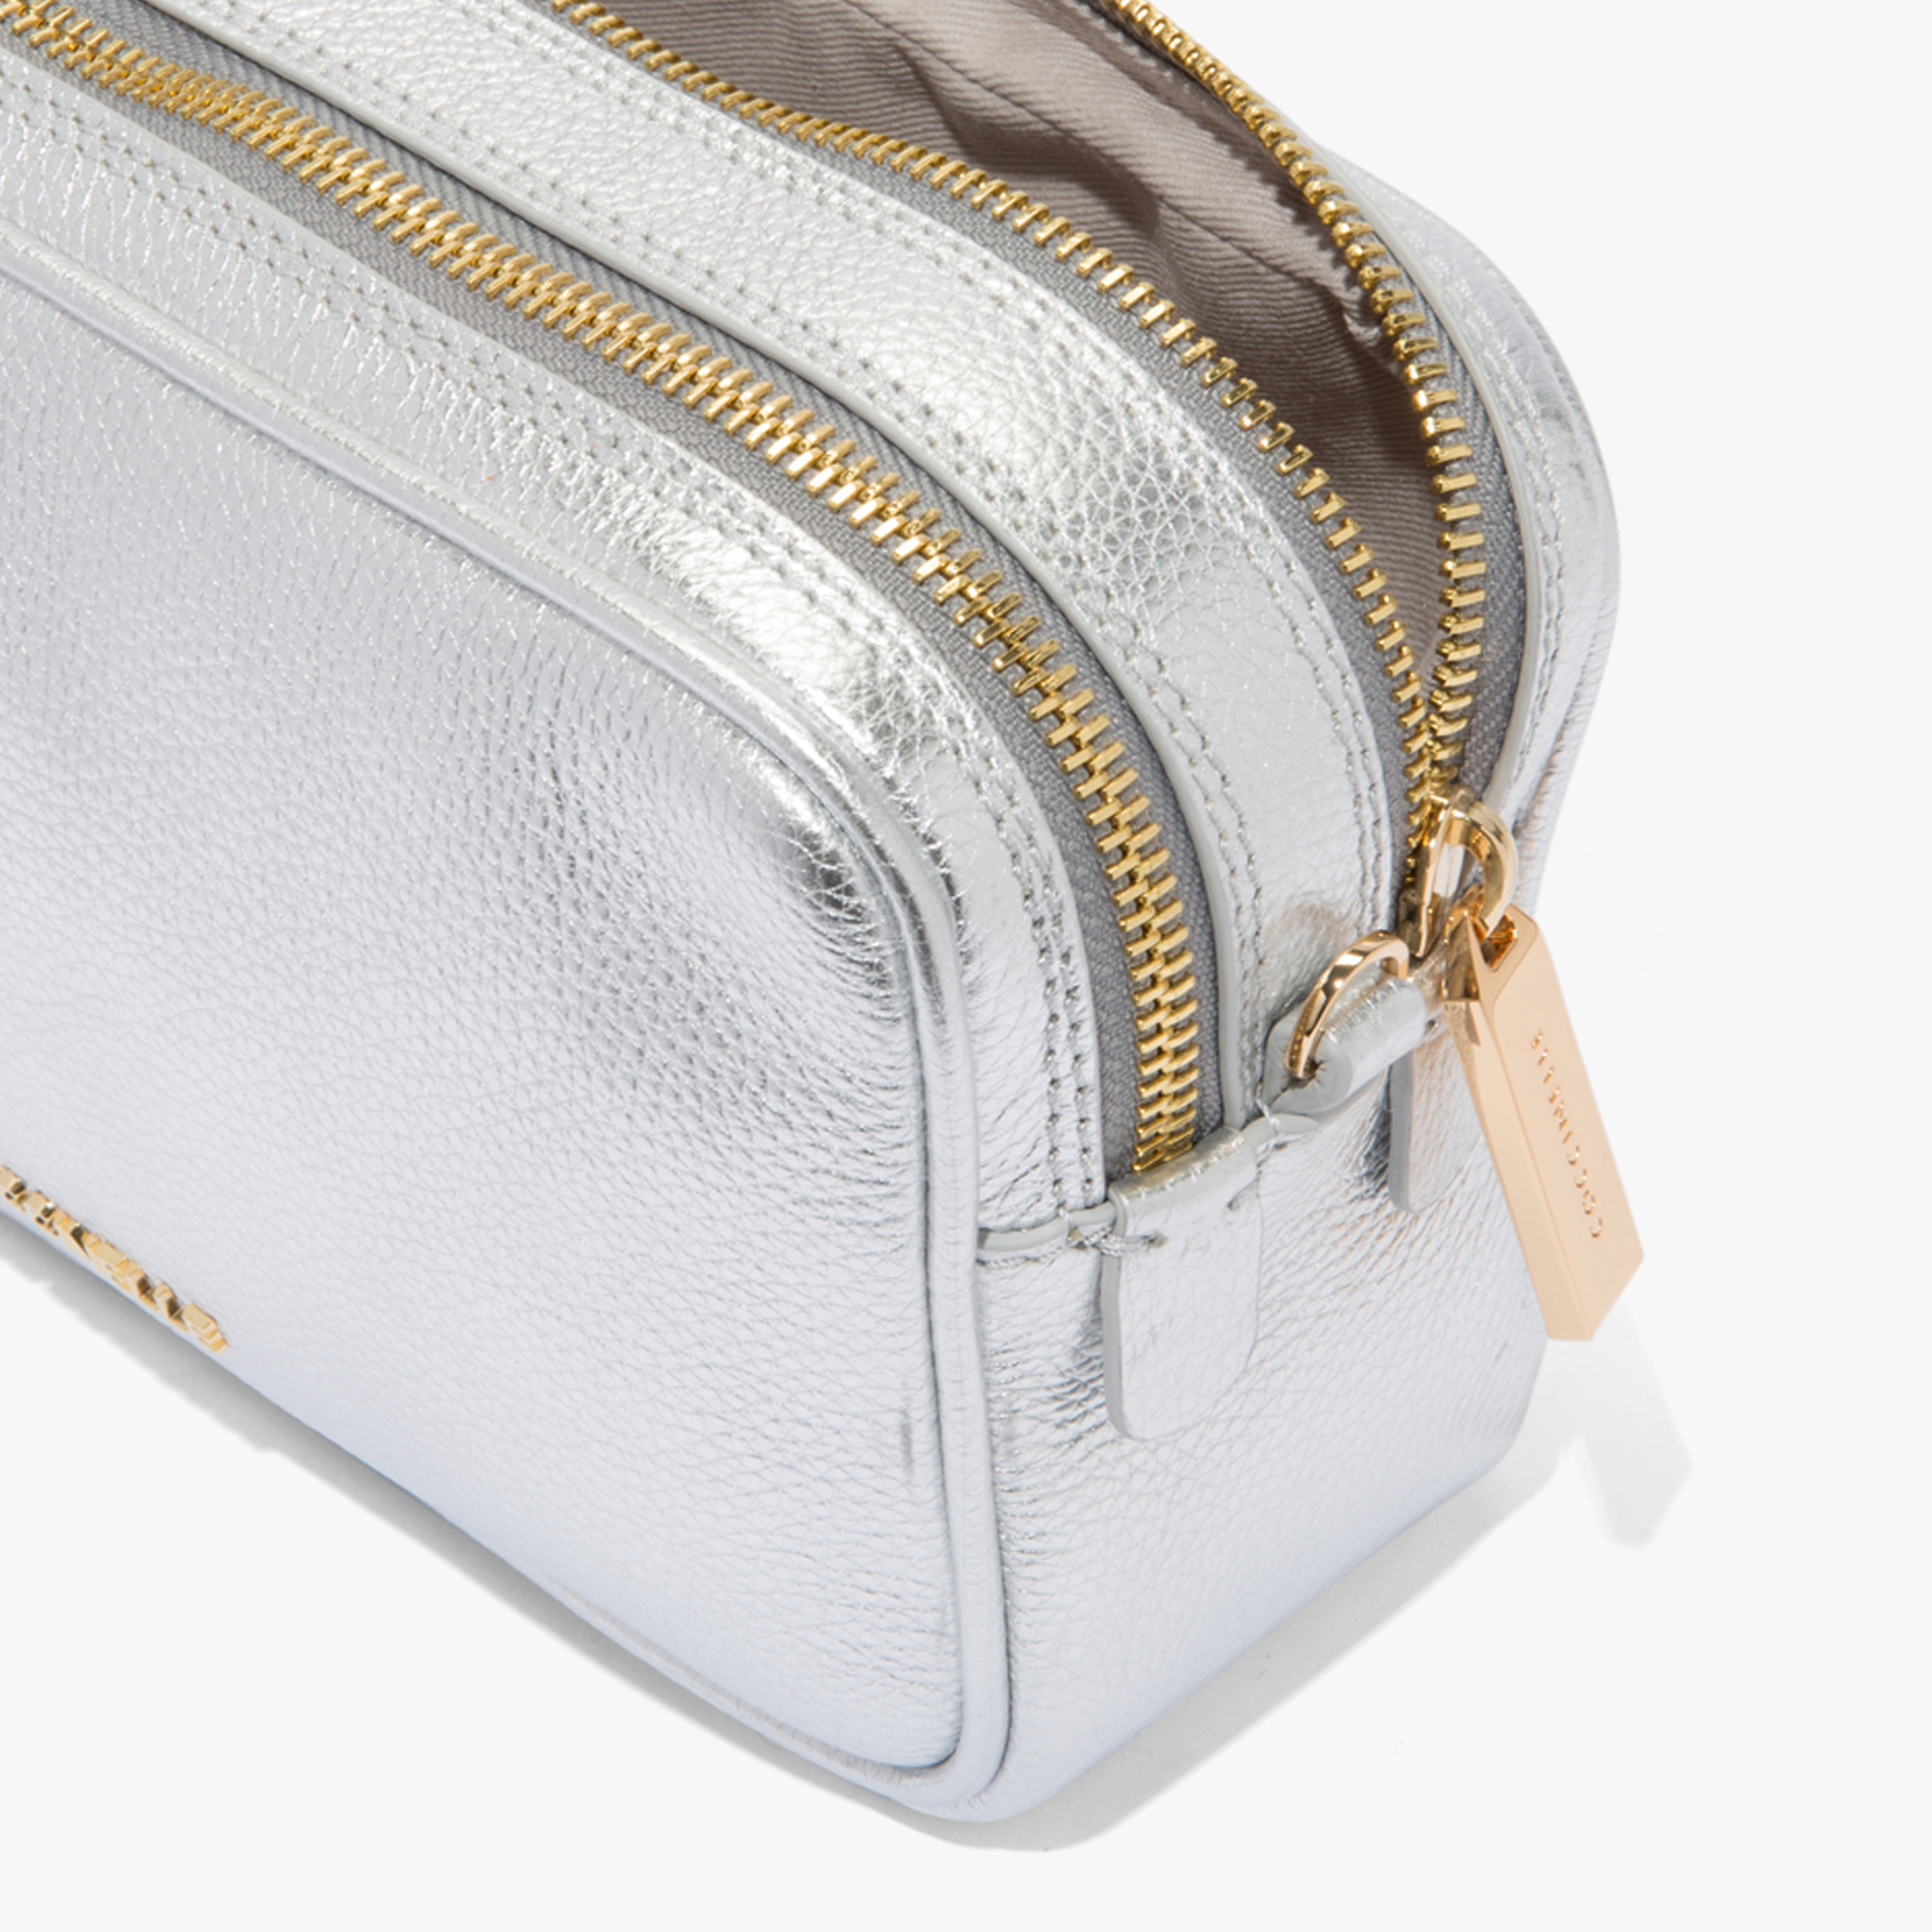 Surya Metal fibre leather mini bag